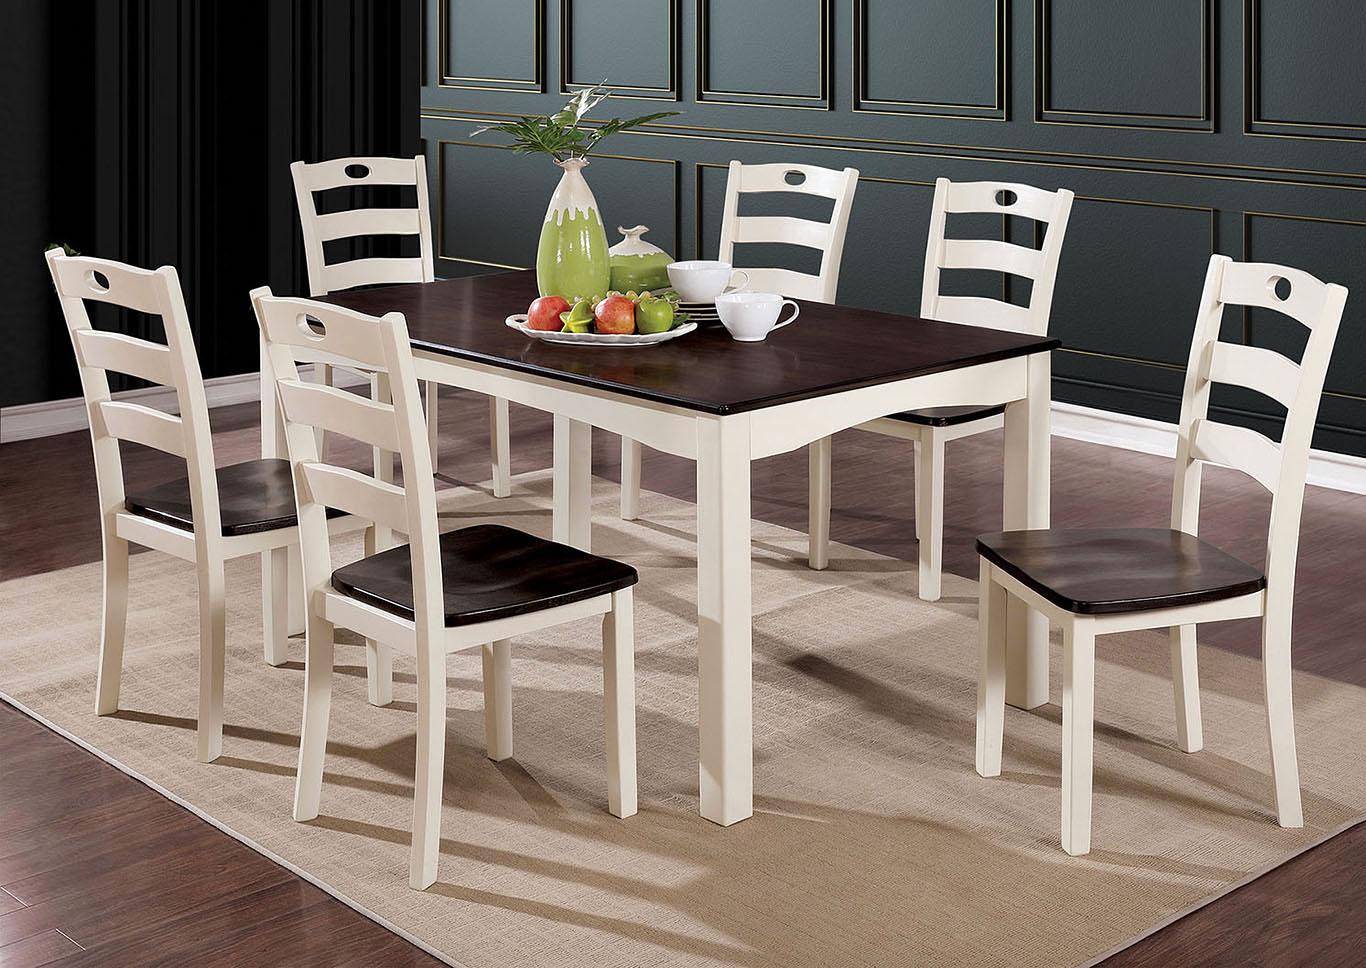 Liliana White Walnut 7 Piece Dining Table SetFurniture Of America